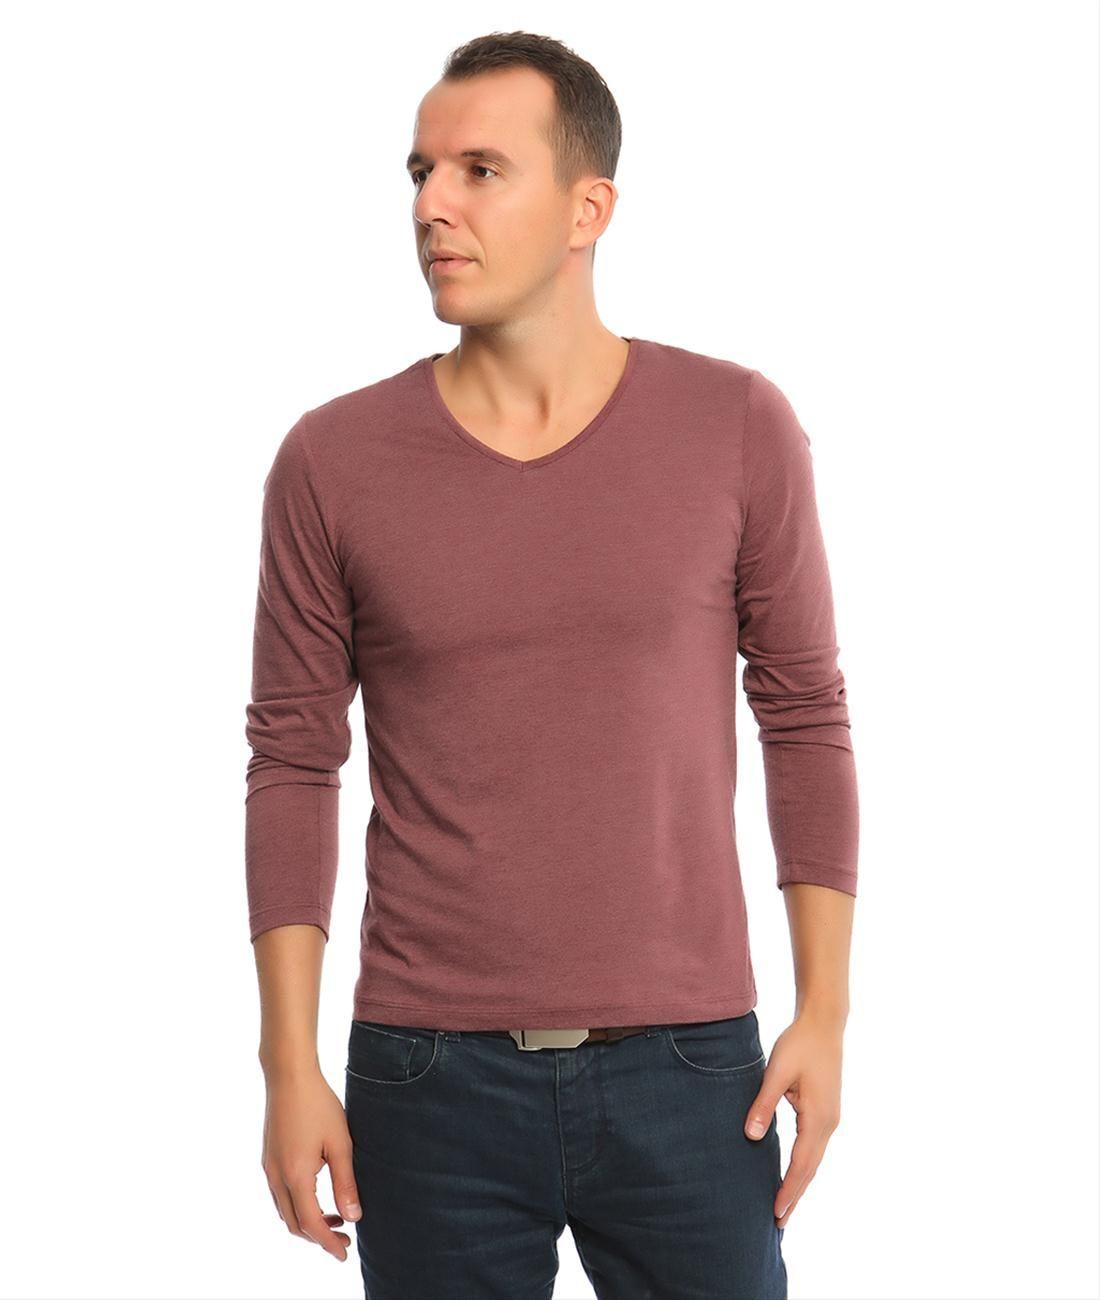 Collezione T Shirt Uzun Kol Giyim